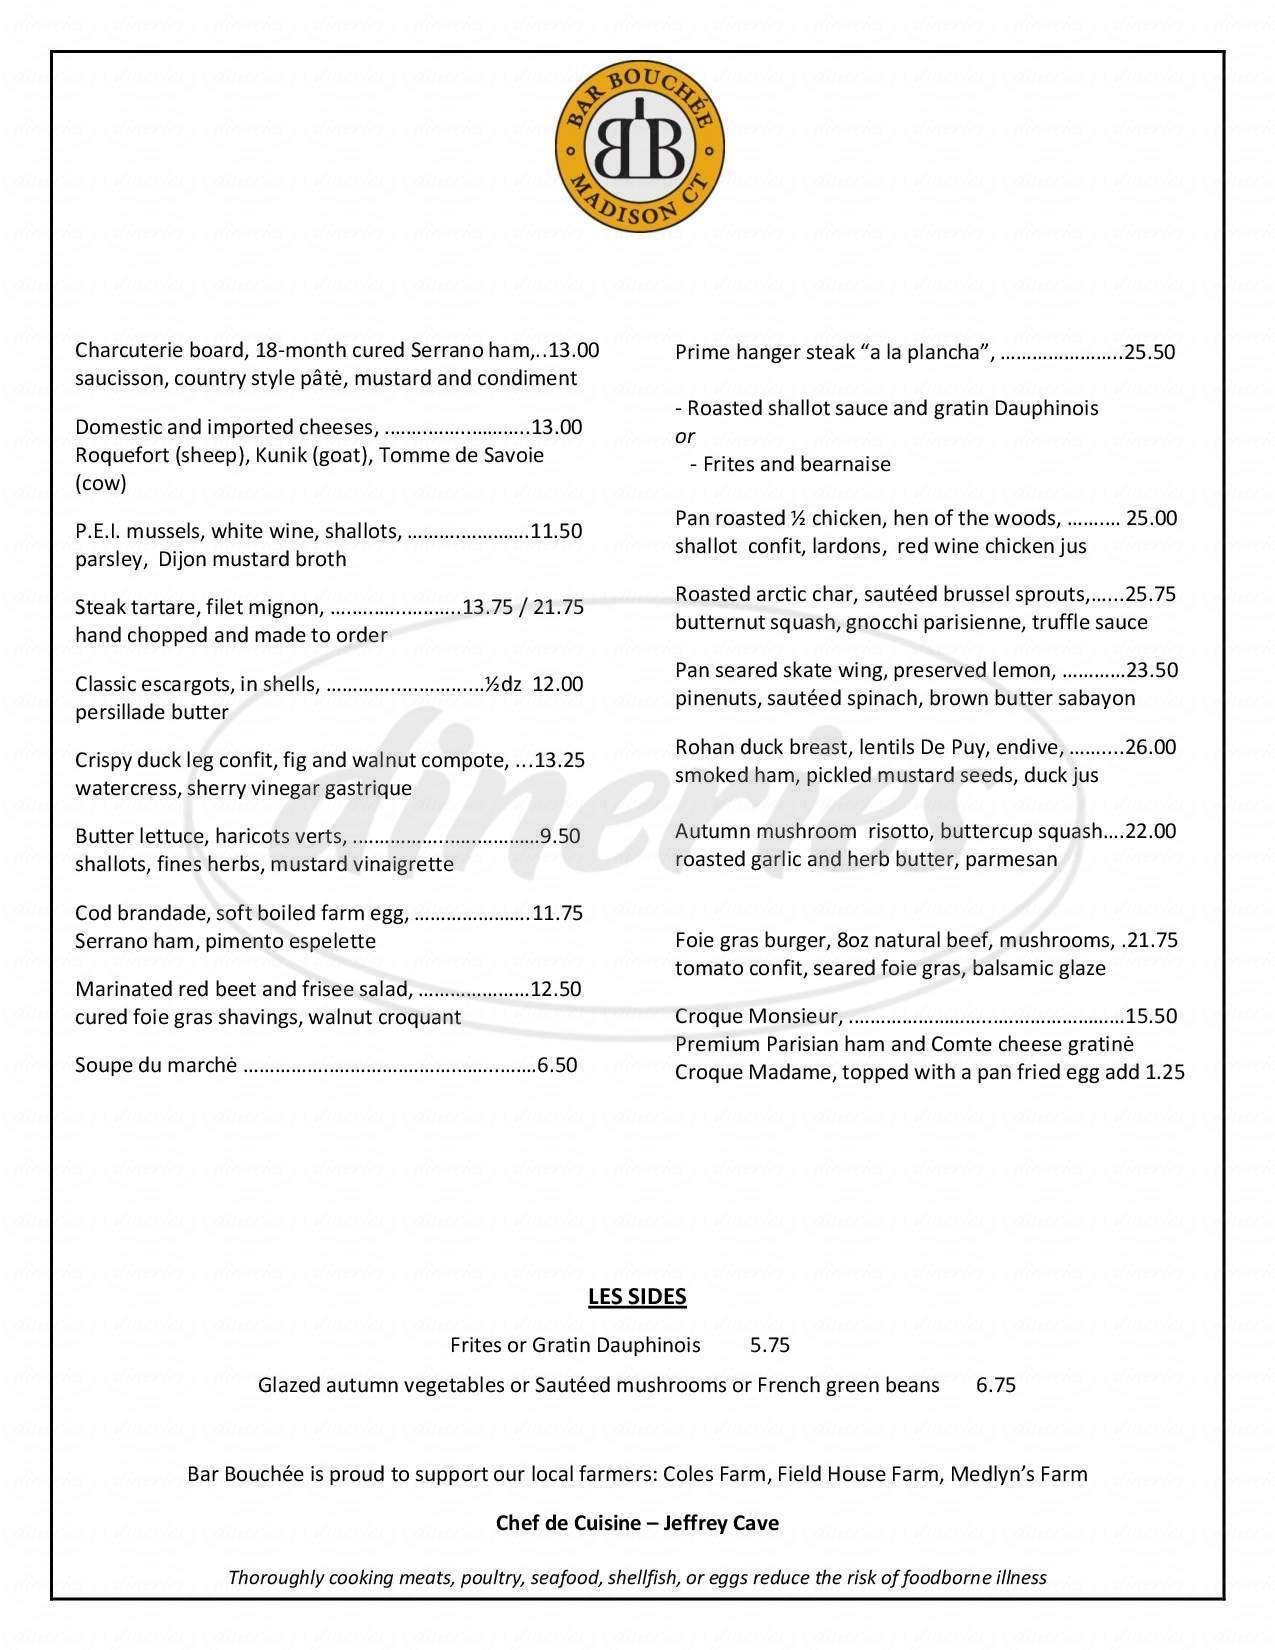 menu for Bar Bouchee